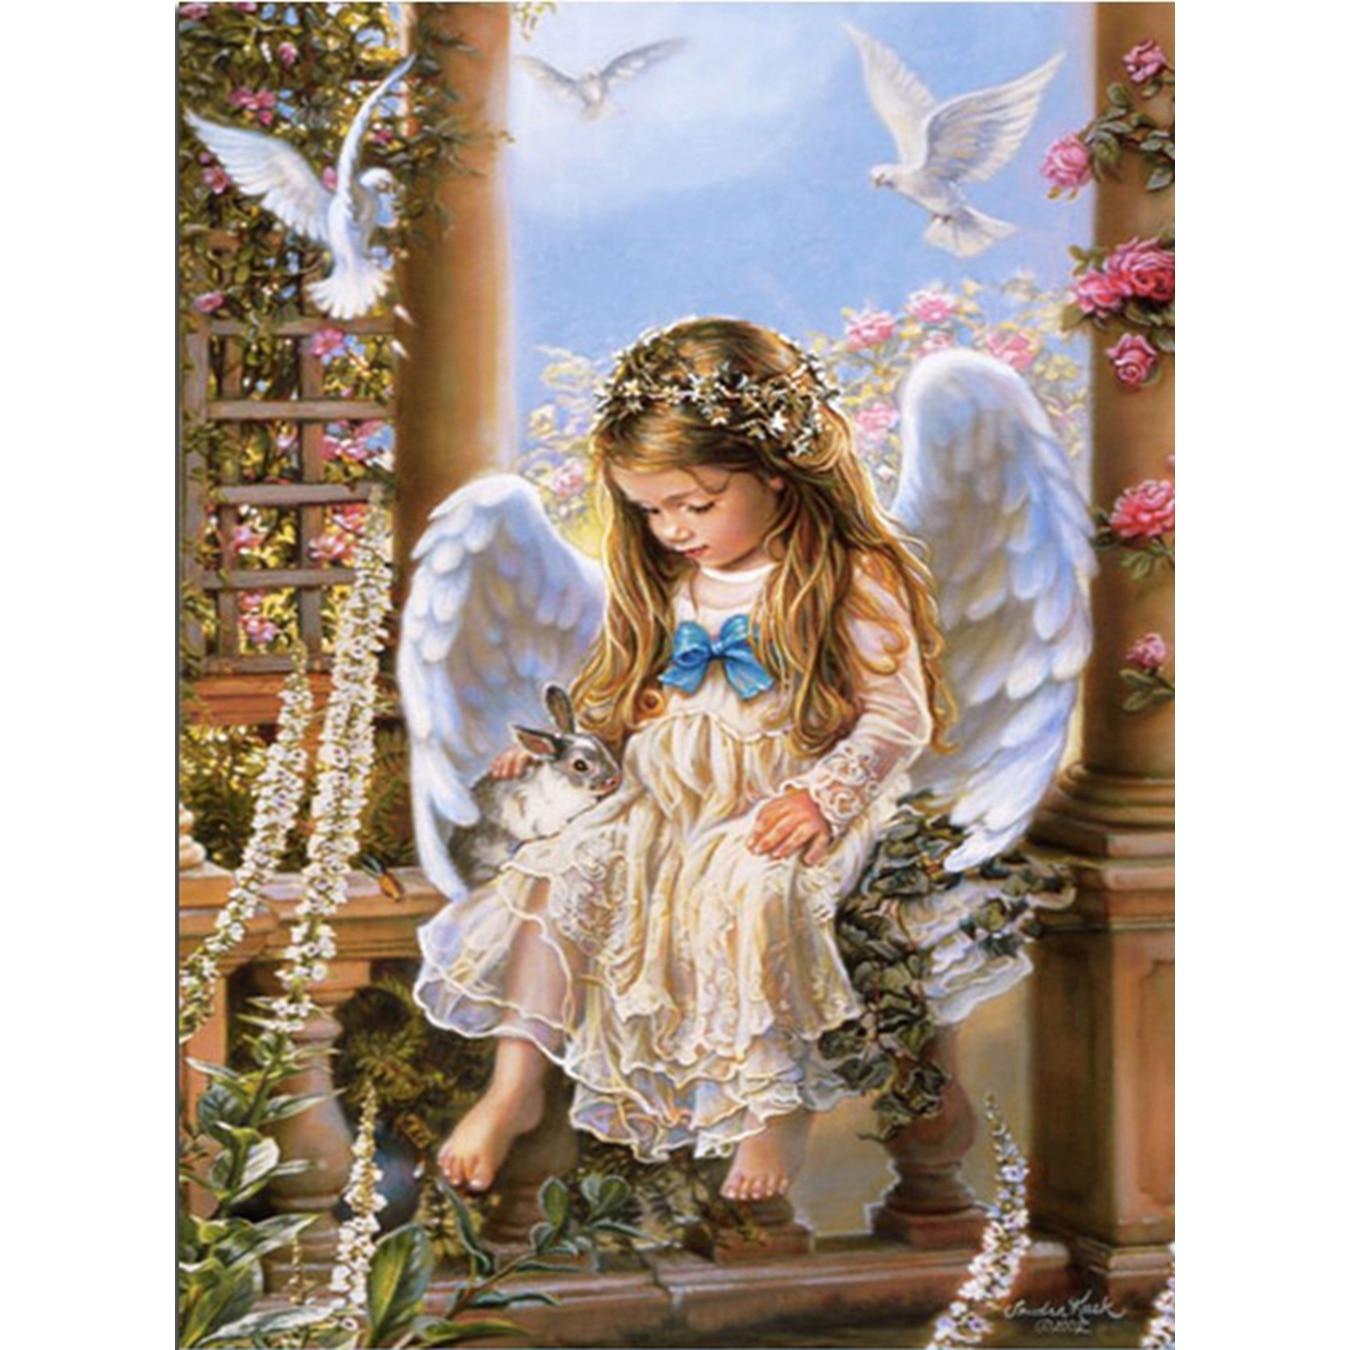 YTG Full Lovely Angel Girl 5D DIY Diamond Painting Needlework Embroidery Cross Stitch Round Rhinestone Room Decor Crafts